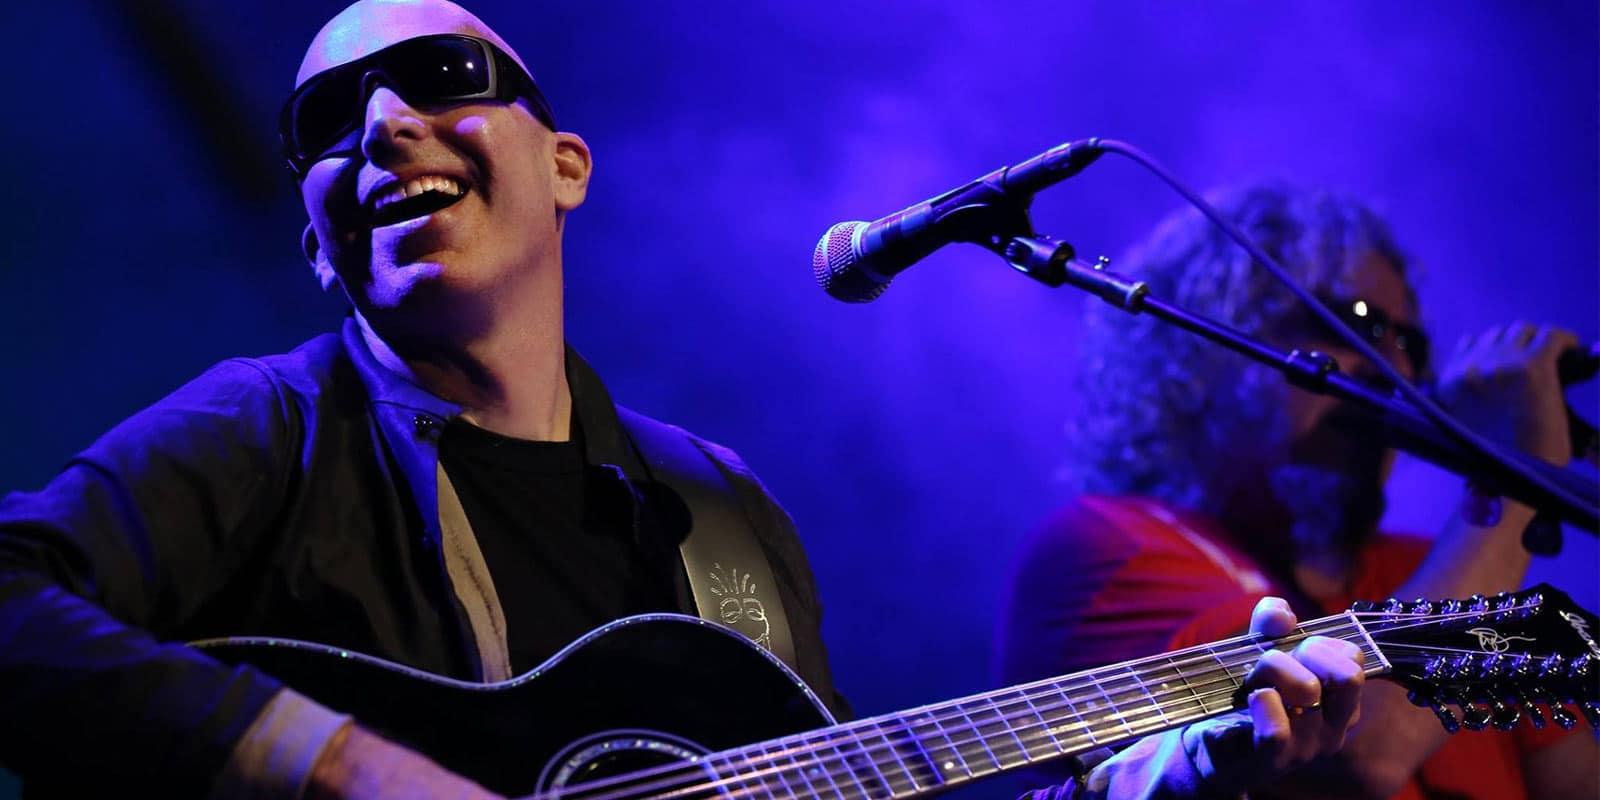 Joe Satriani JSA20 JSA5 acoustic Ibanez signature